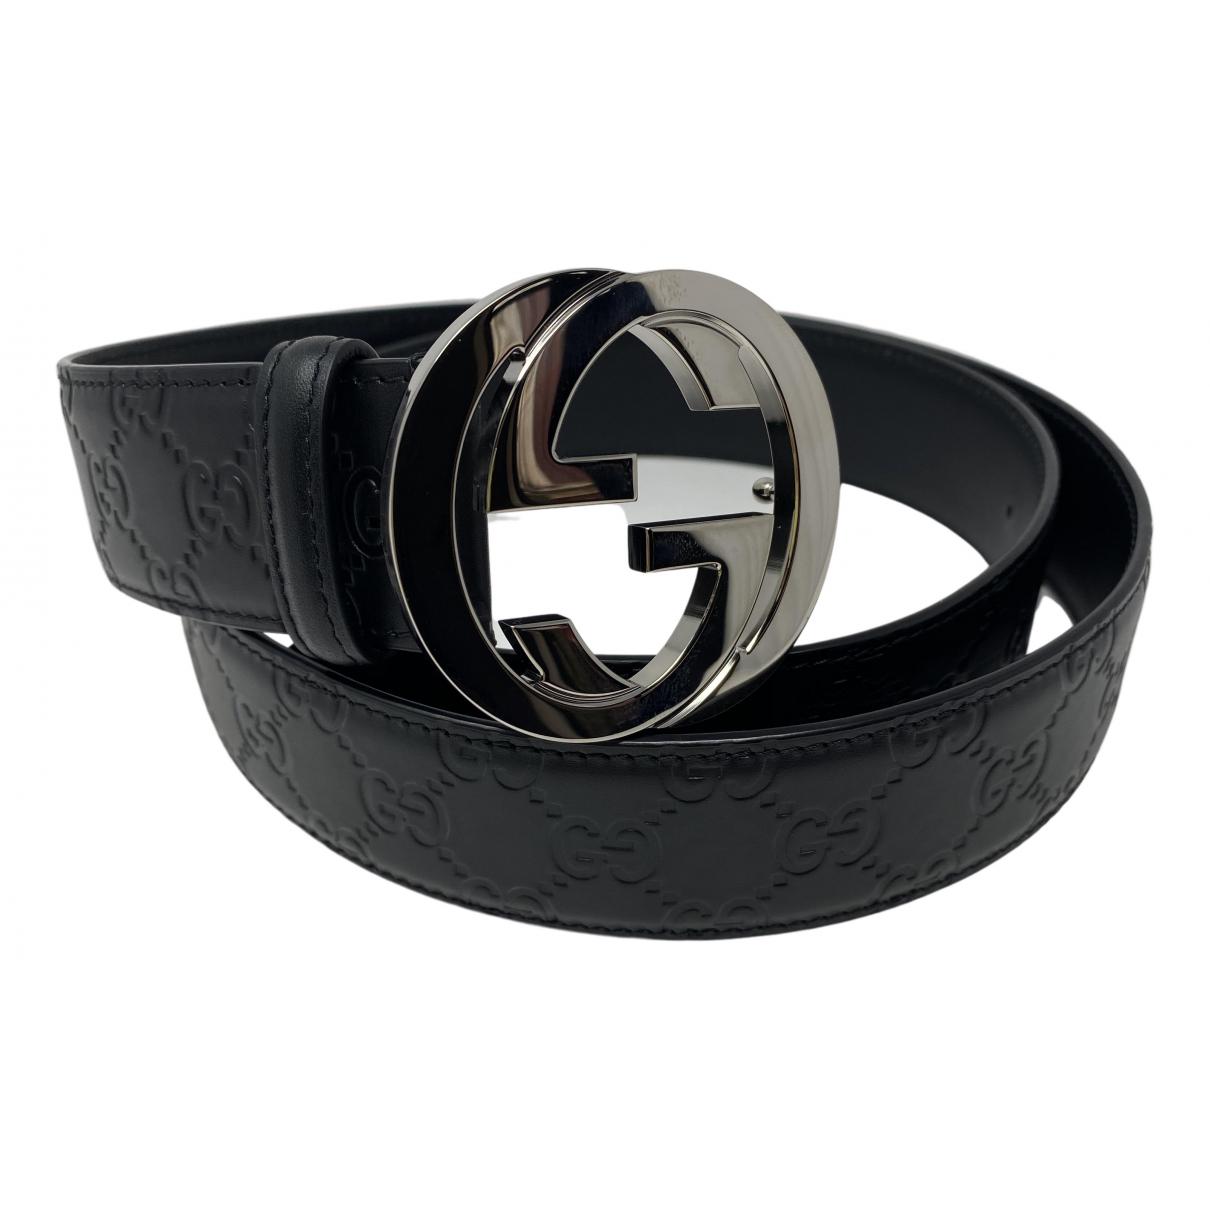 Gucci GG Buckle Black Leather belt for Men XL international